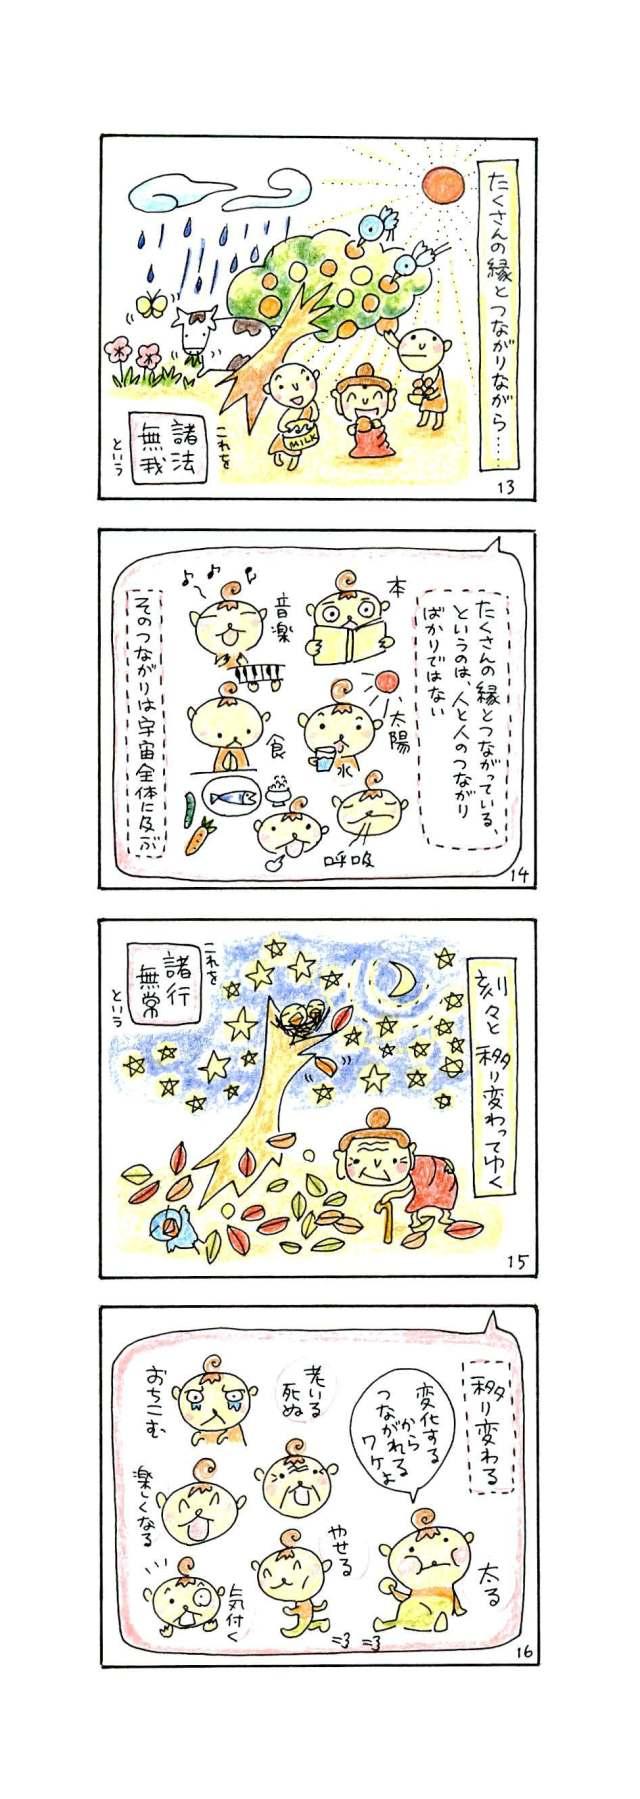 般若心経「五蘊と空」p13-p16